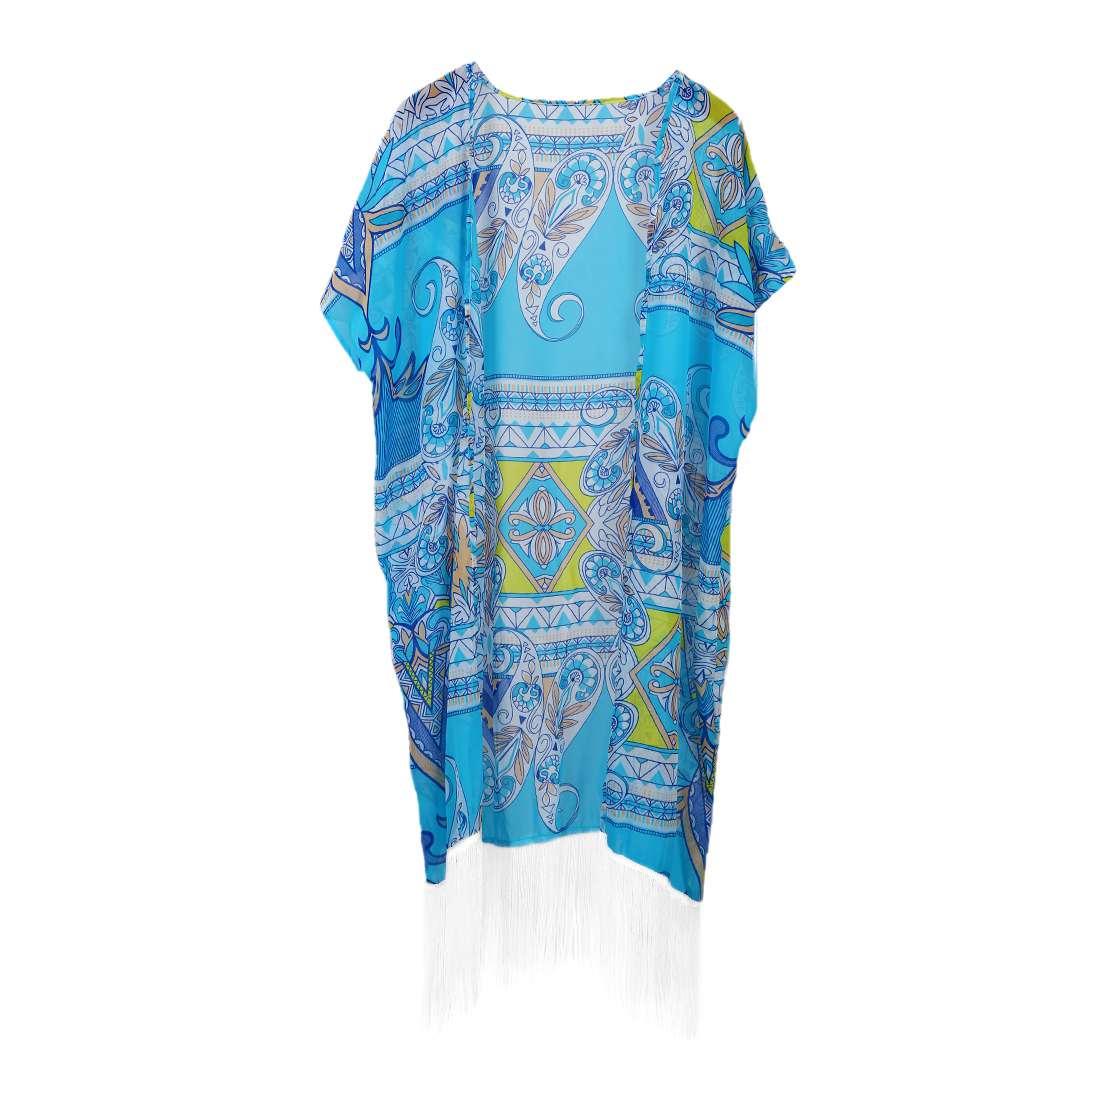 Women Bikini Beach Cover Swimsuit Bathing Suit Chiffon Cardigan, Blue One Size